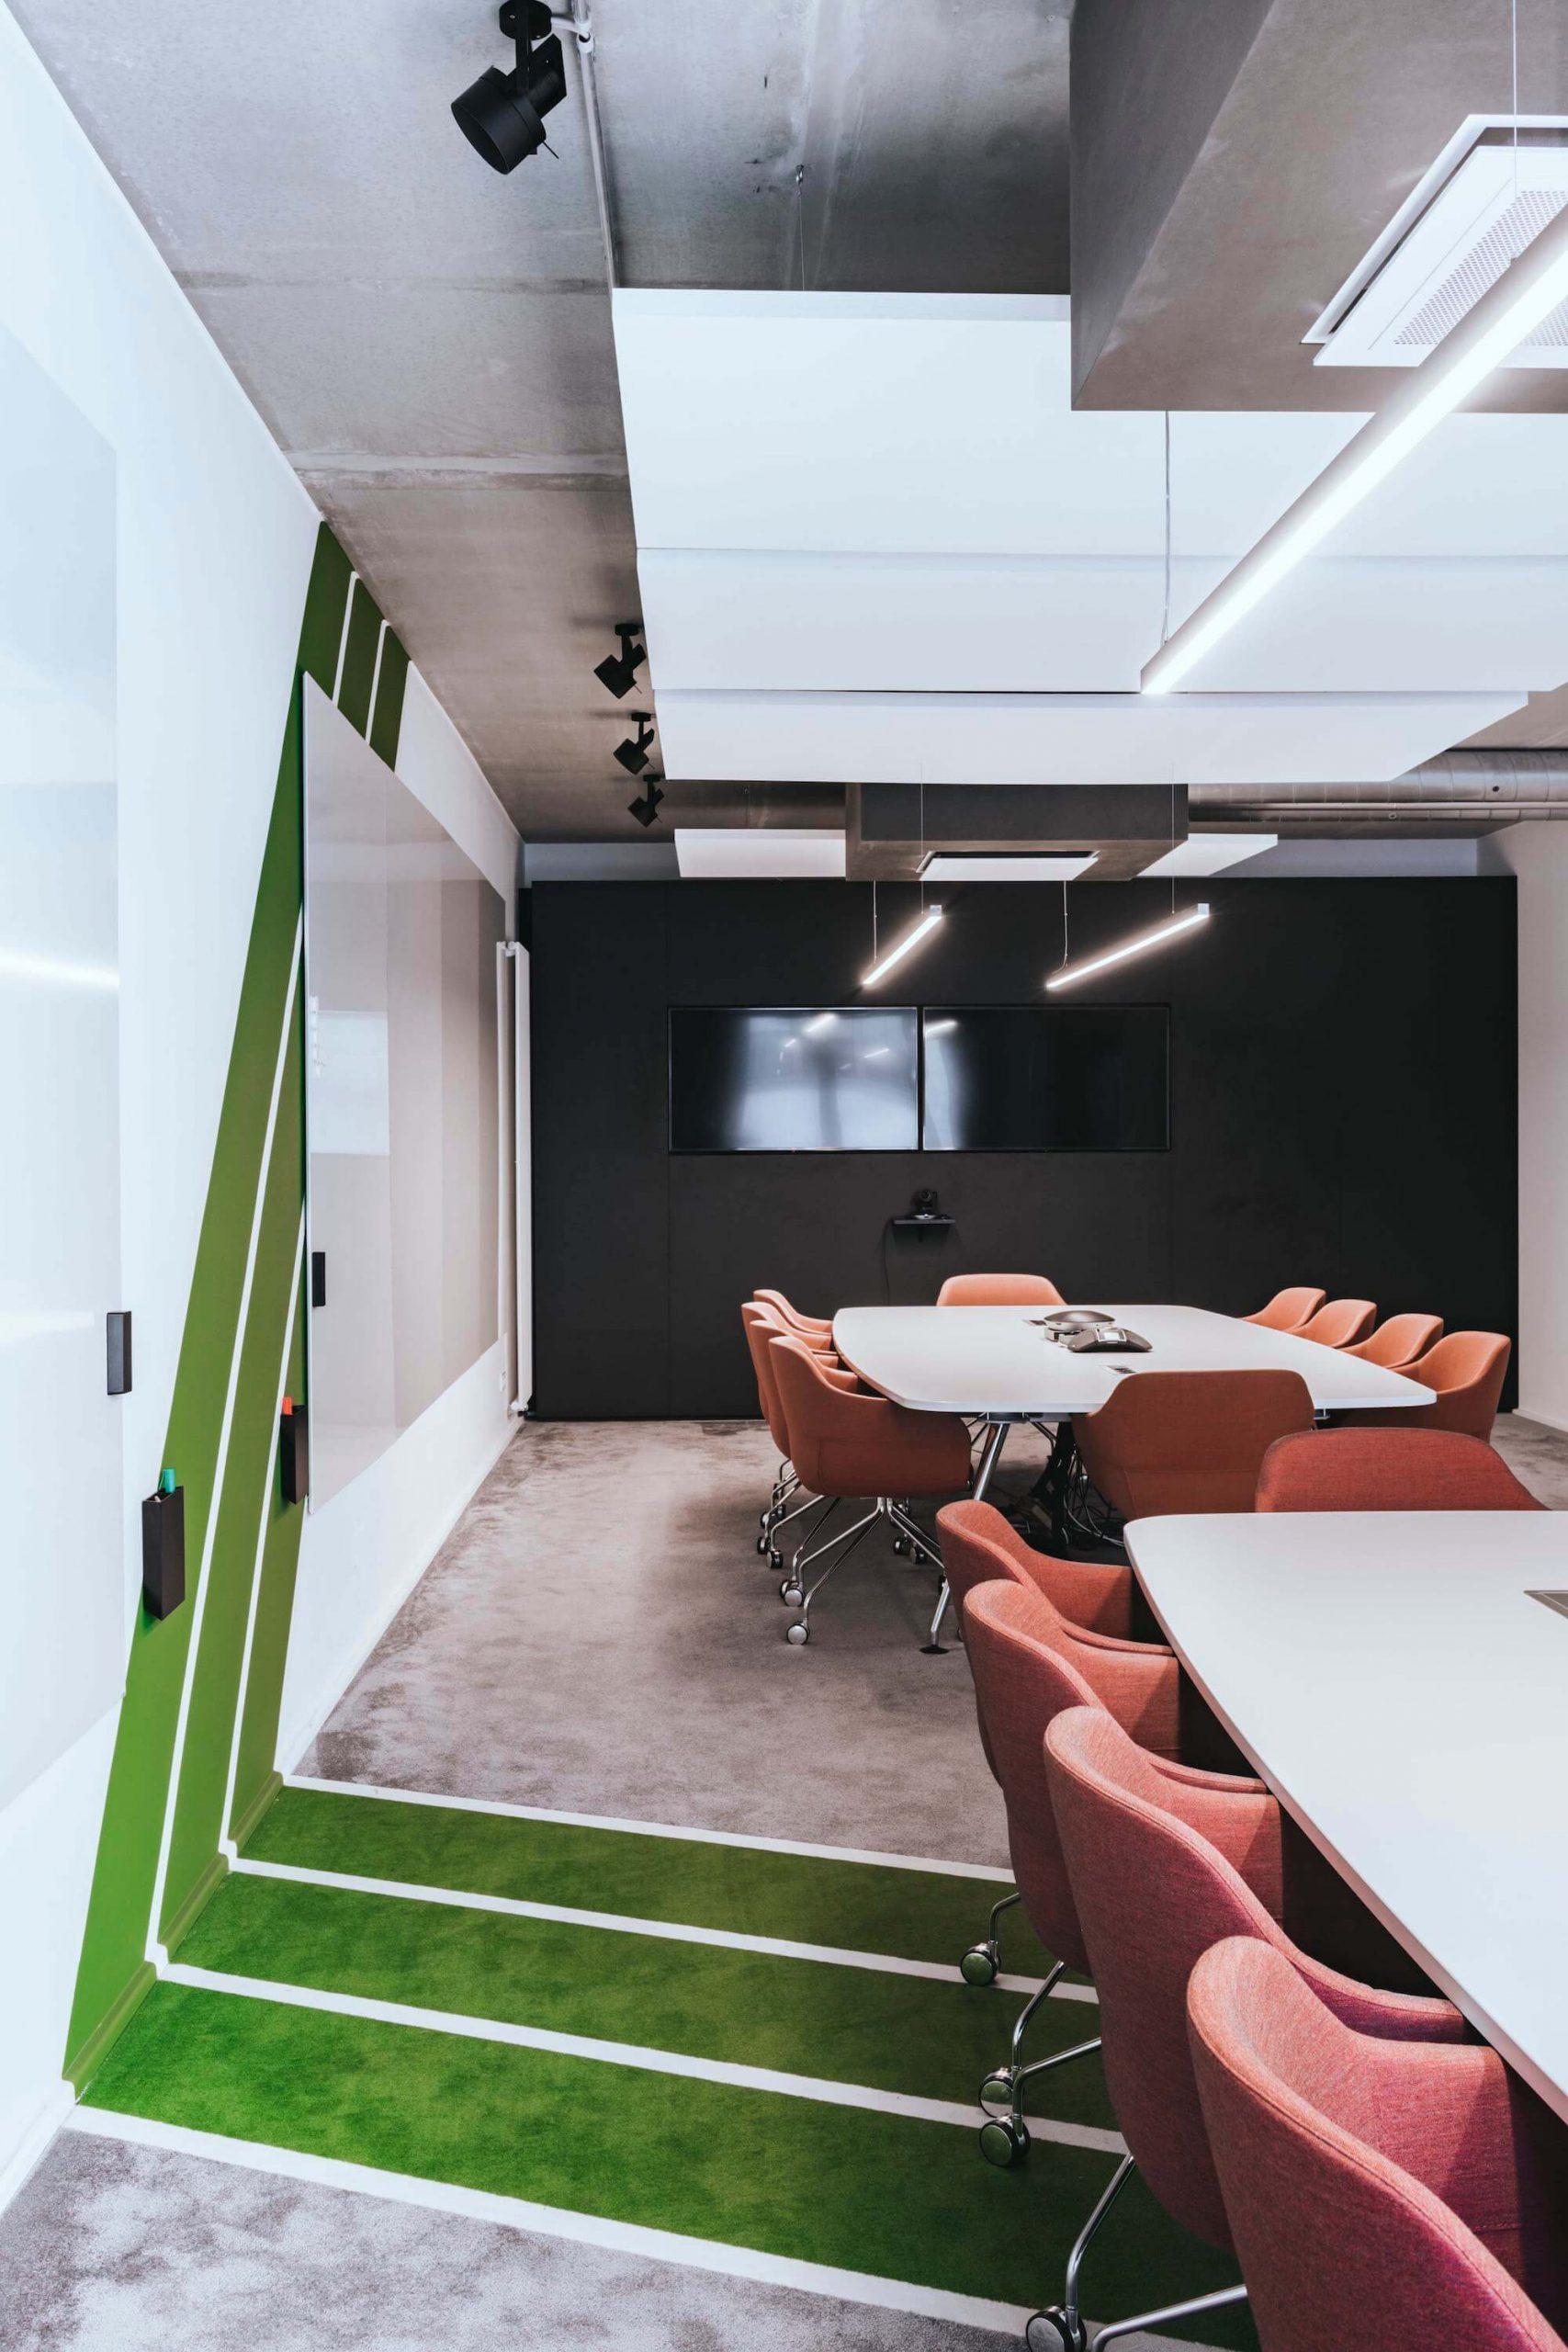 Onefootball Startup Büro TKEZ Architekten Rudi Assauer Lounge Sessel